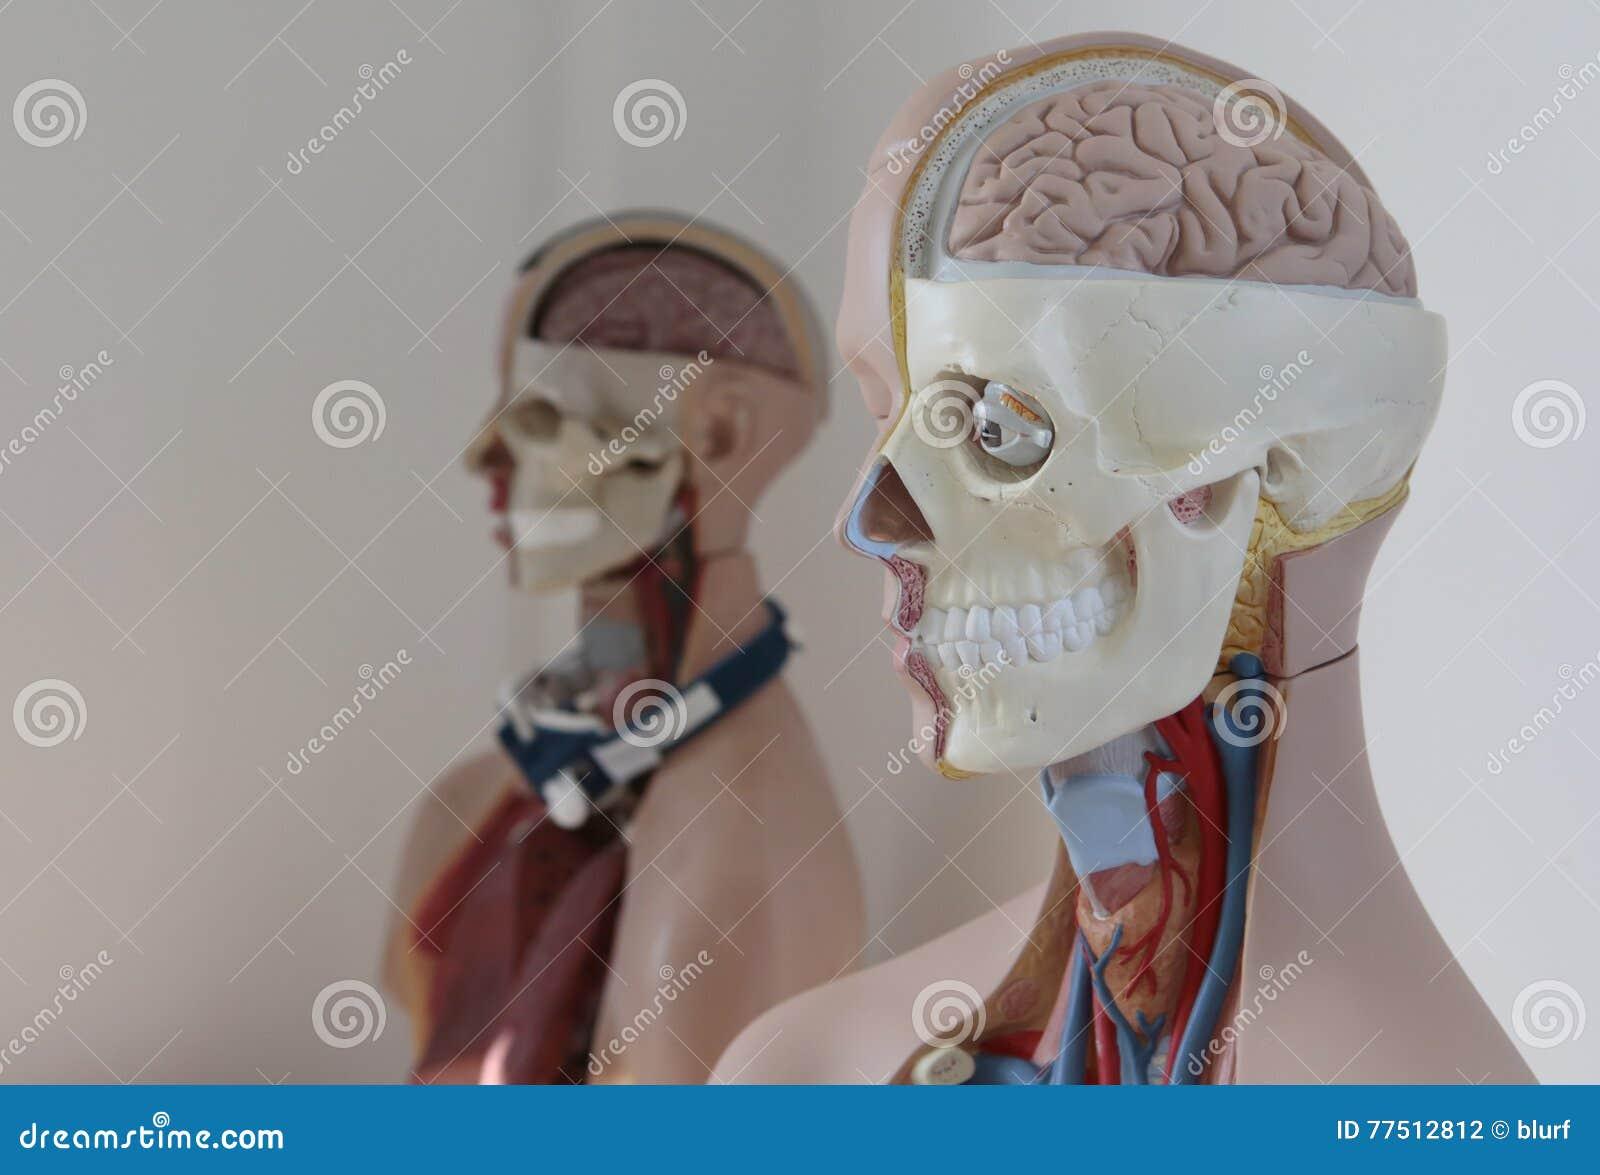 Anatomy Dummy Model Stock Photo Image Of Skull Model 77512812